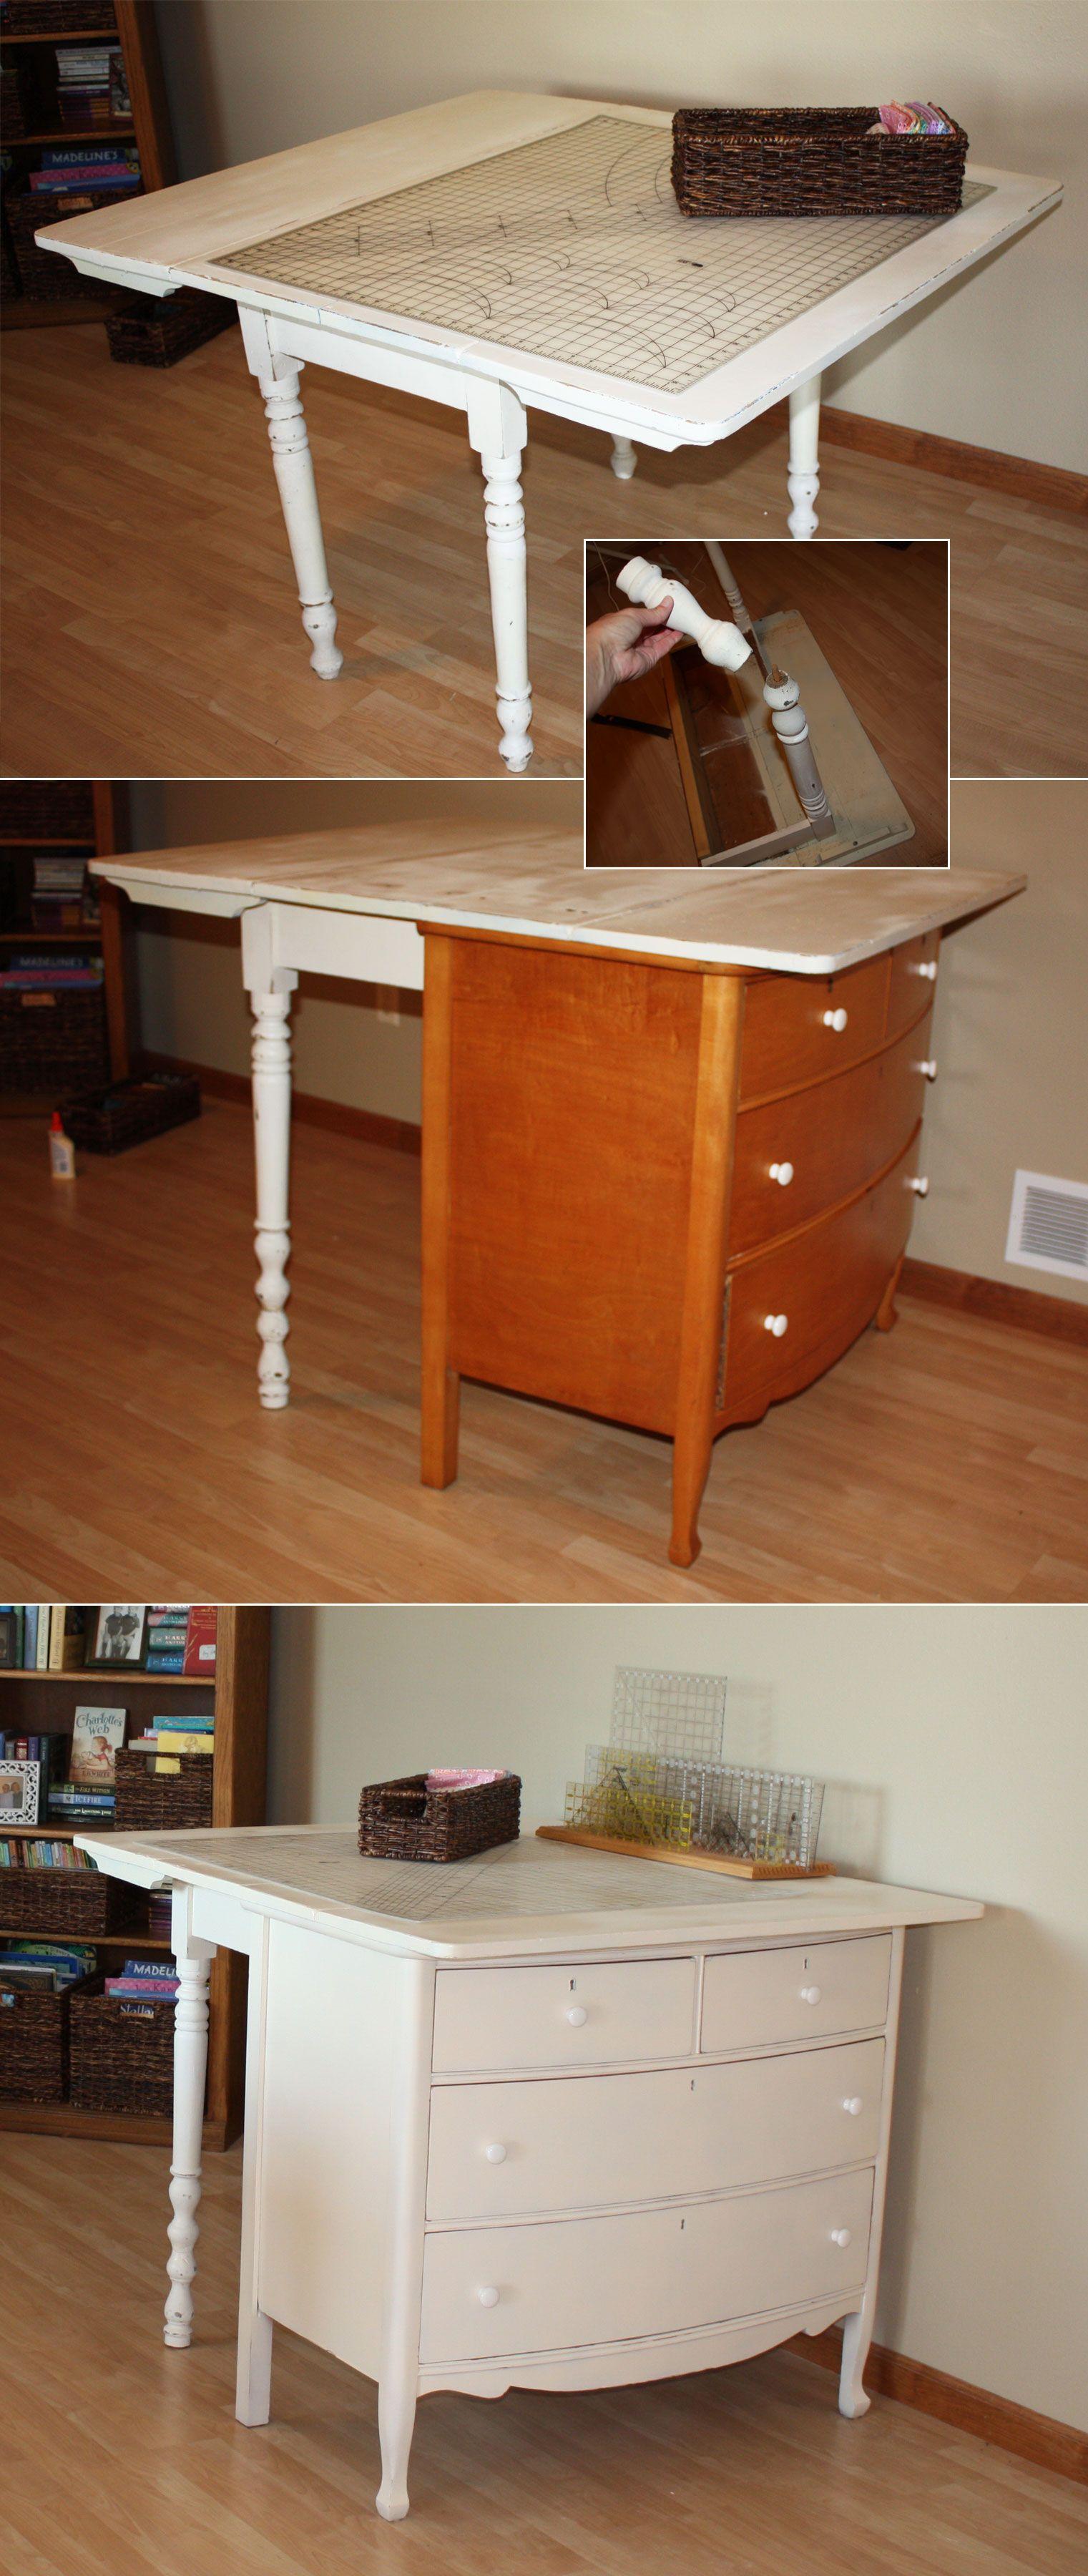 Carried away quilting repurposed furniture furniture